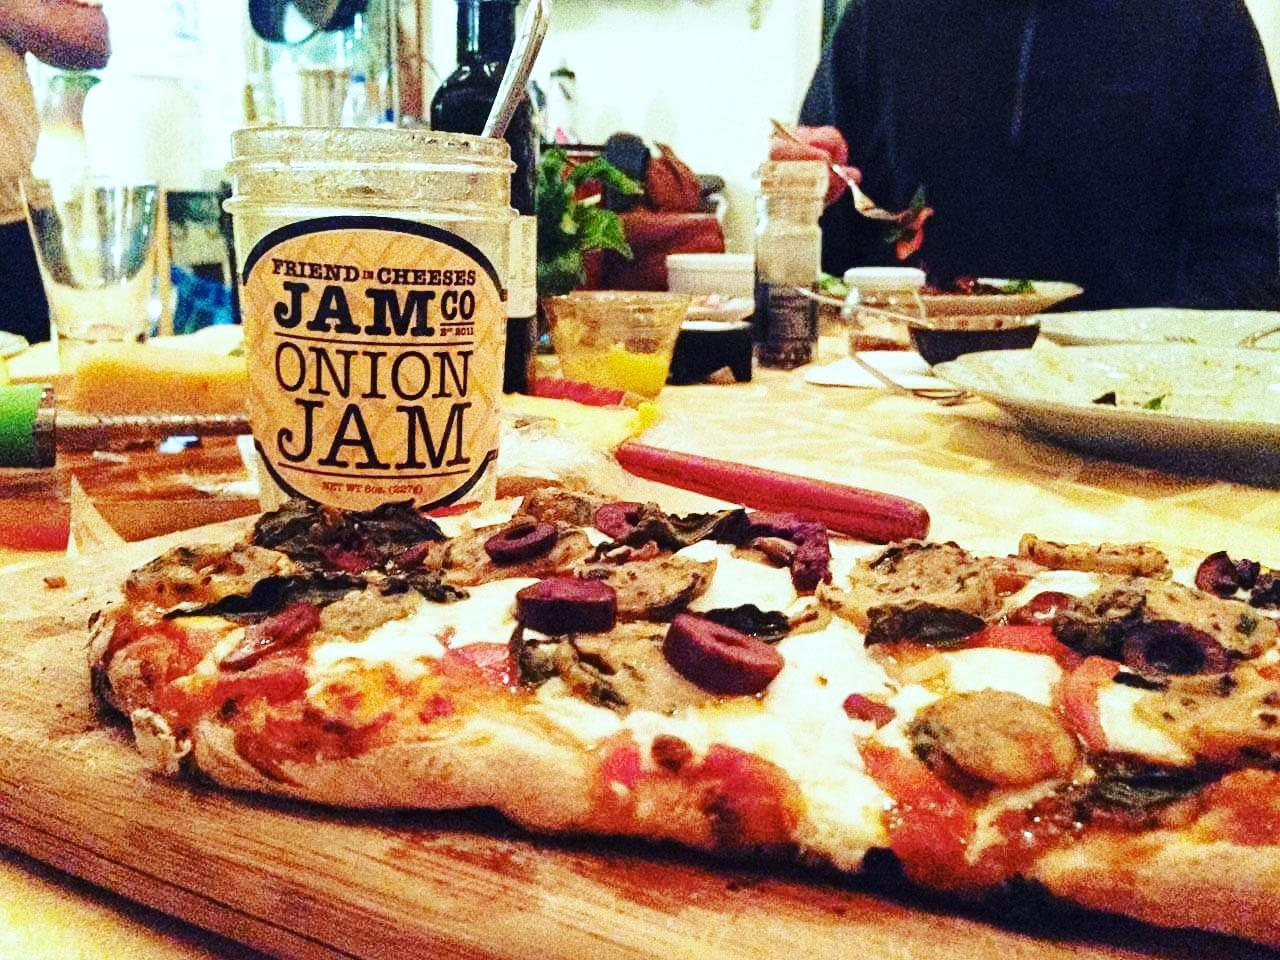 Slather Onion Jam onto pizza dough for an amazing sauce!